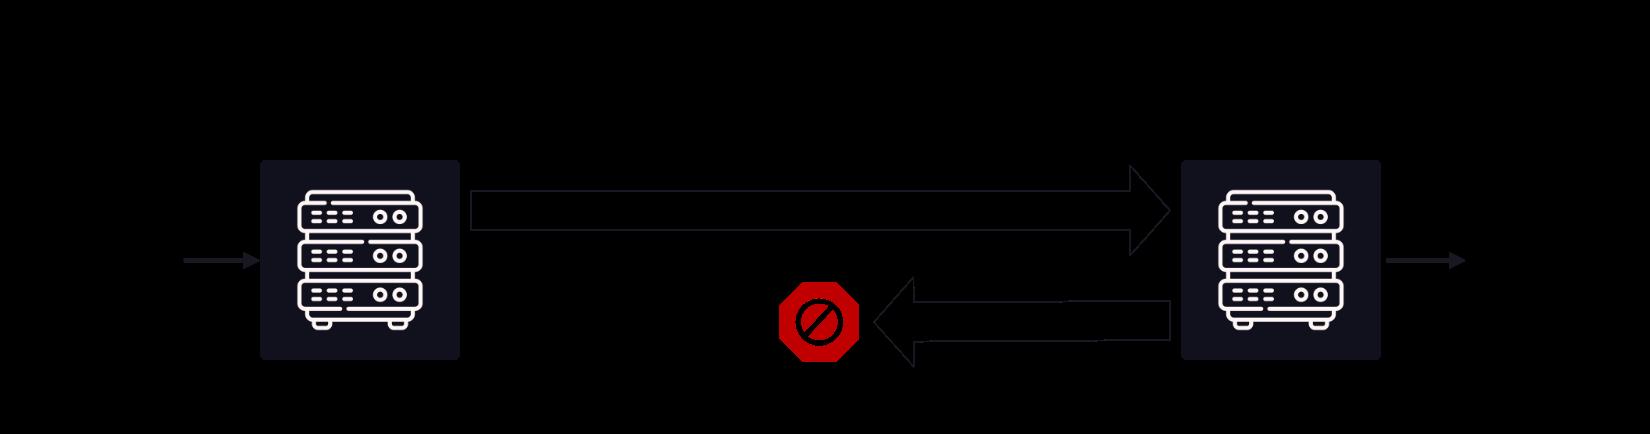 Integration into a data diode diagram